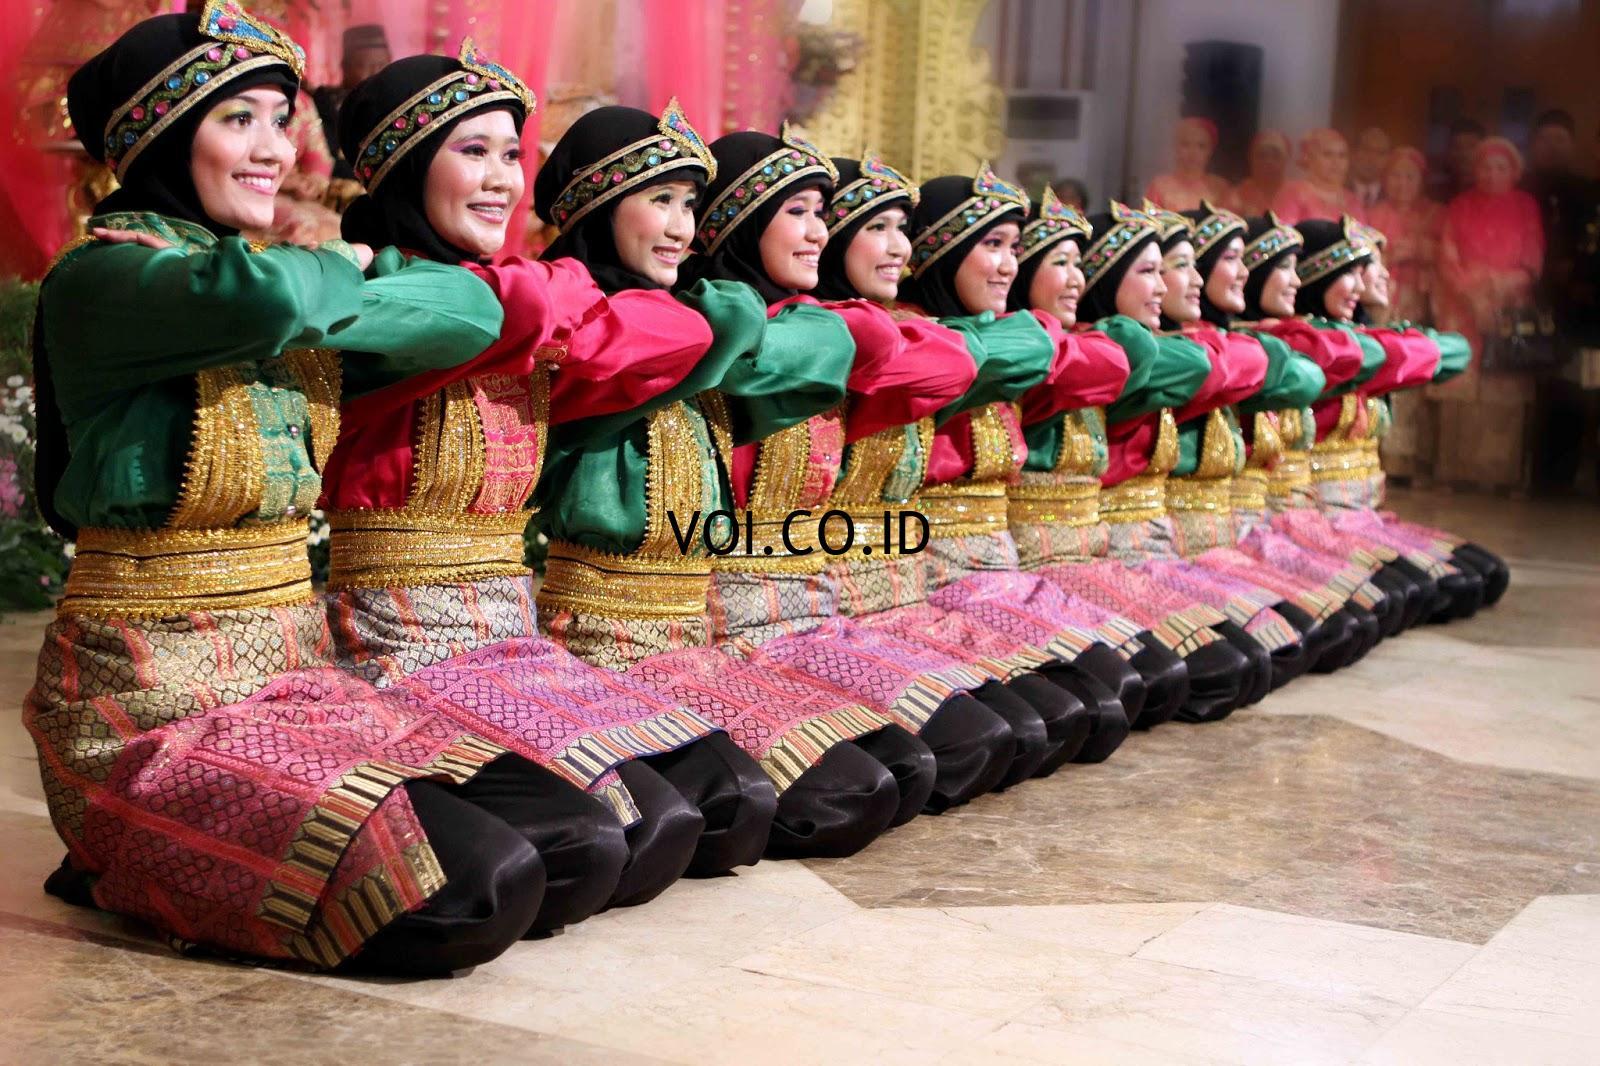 Contoh-Seni-Budaya-Nusantara-Indonesia-Tari-Saman